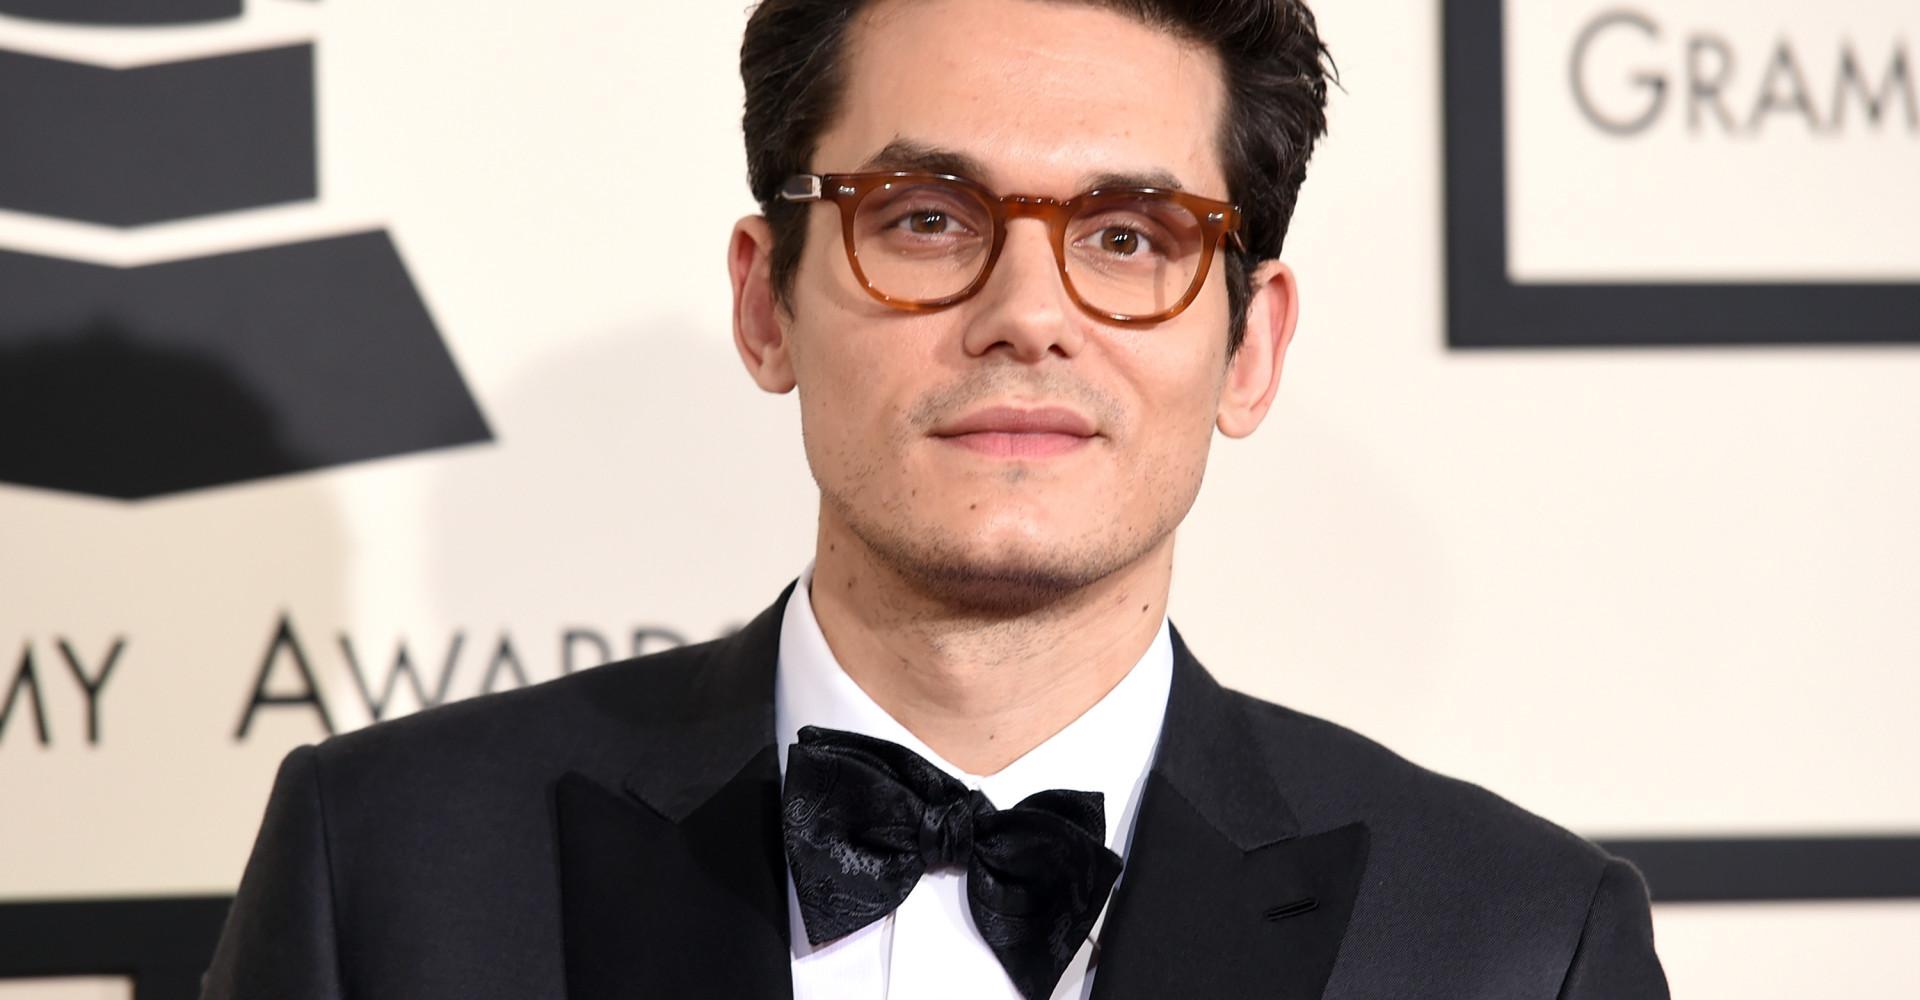 Which celeb's heart will John Mayer break next?